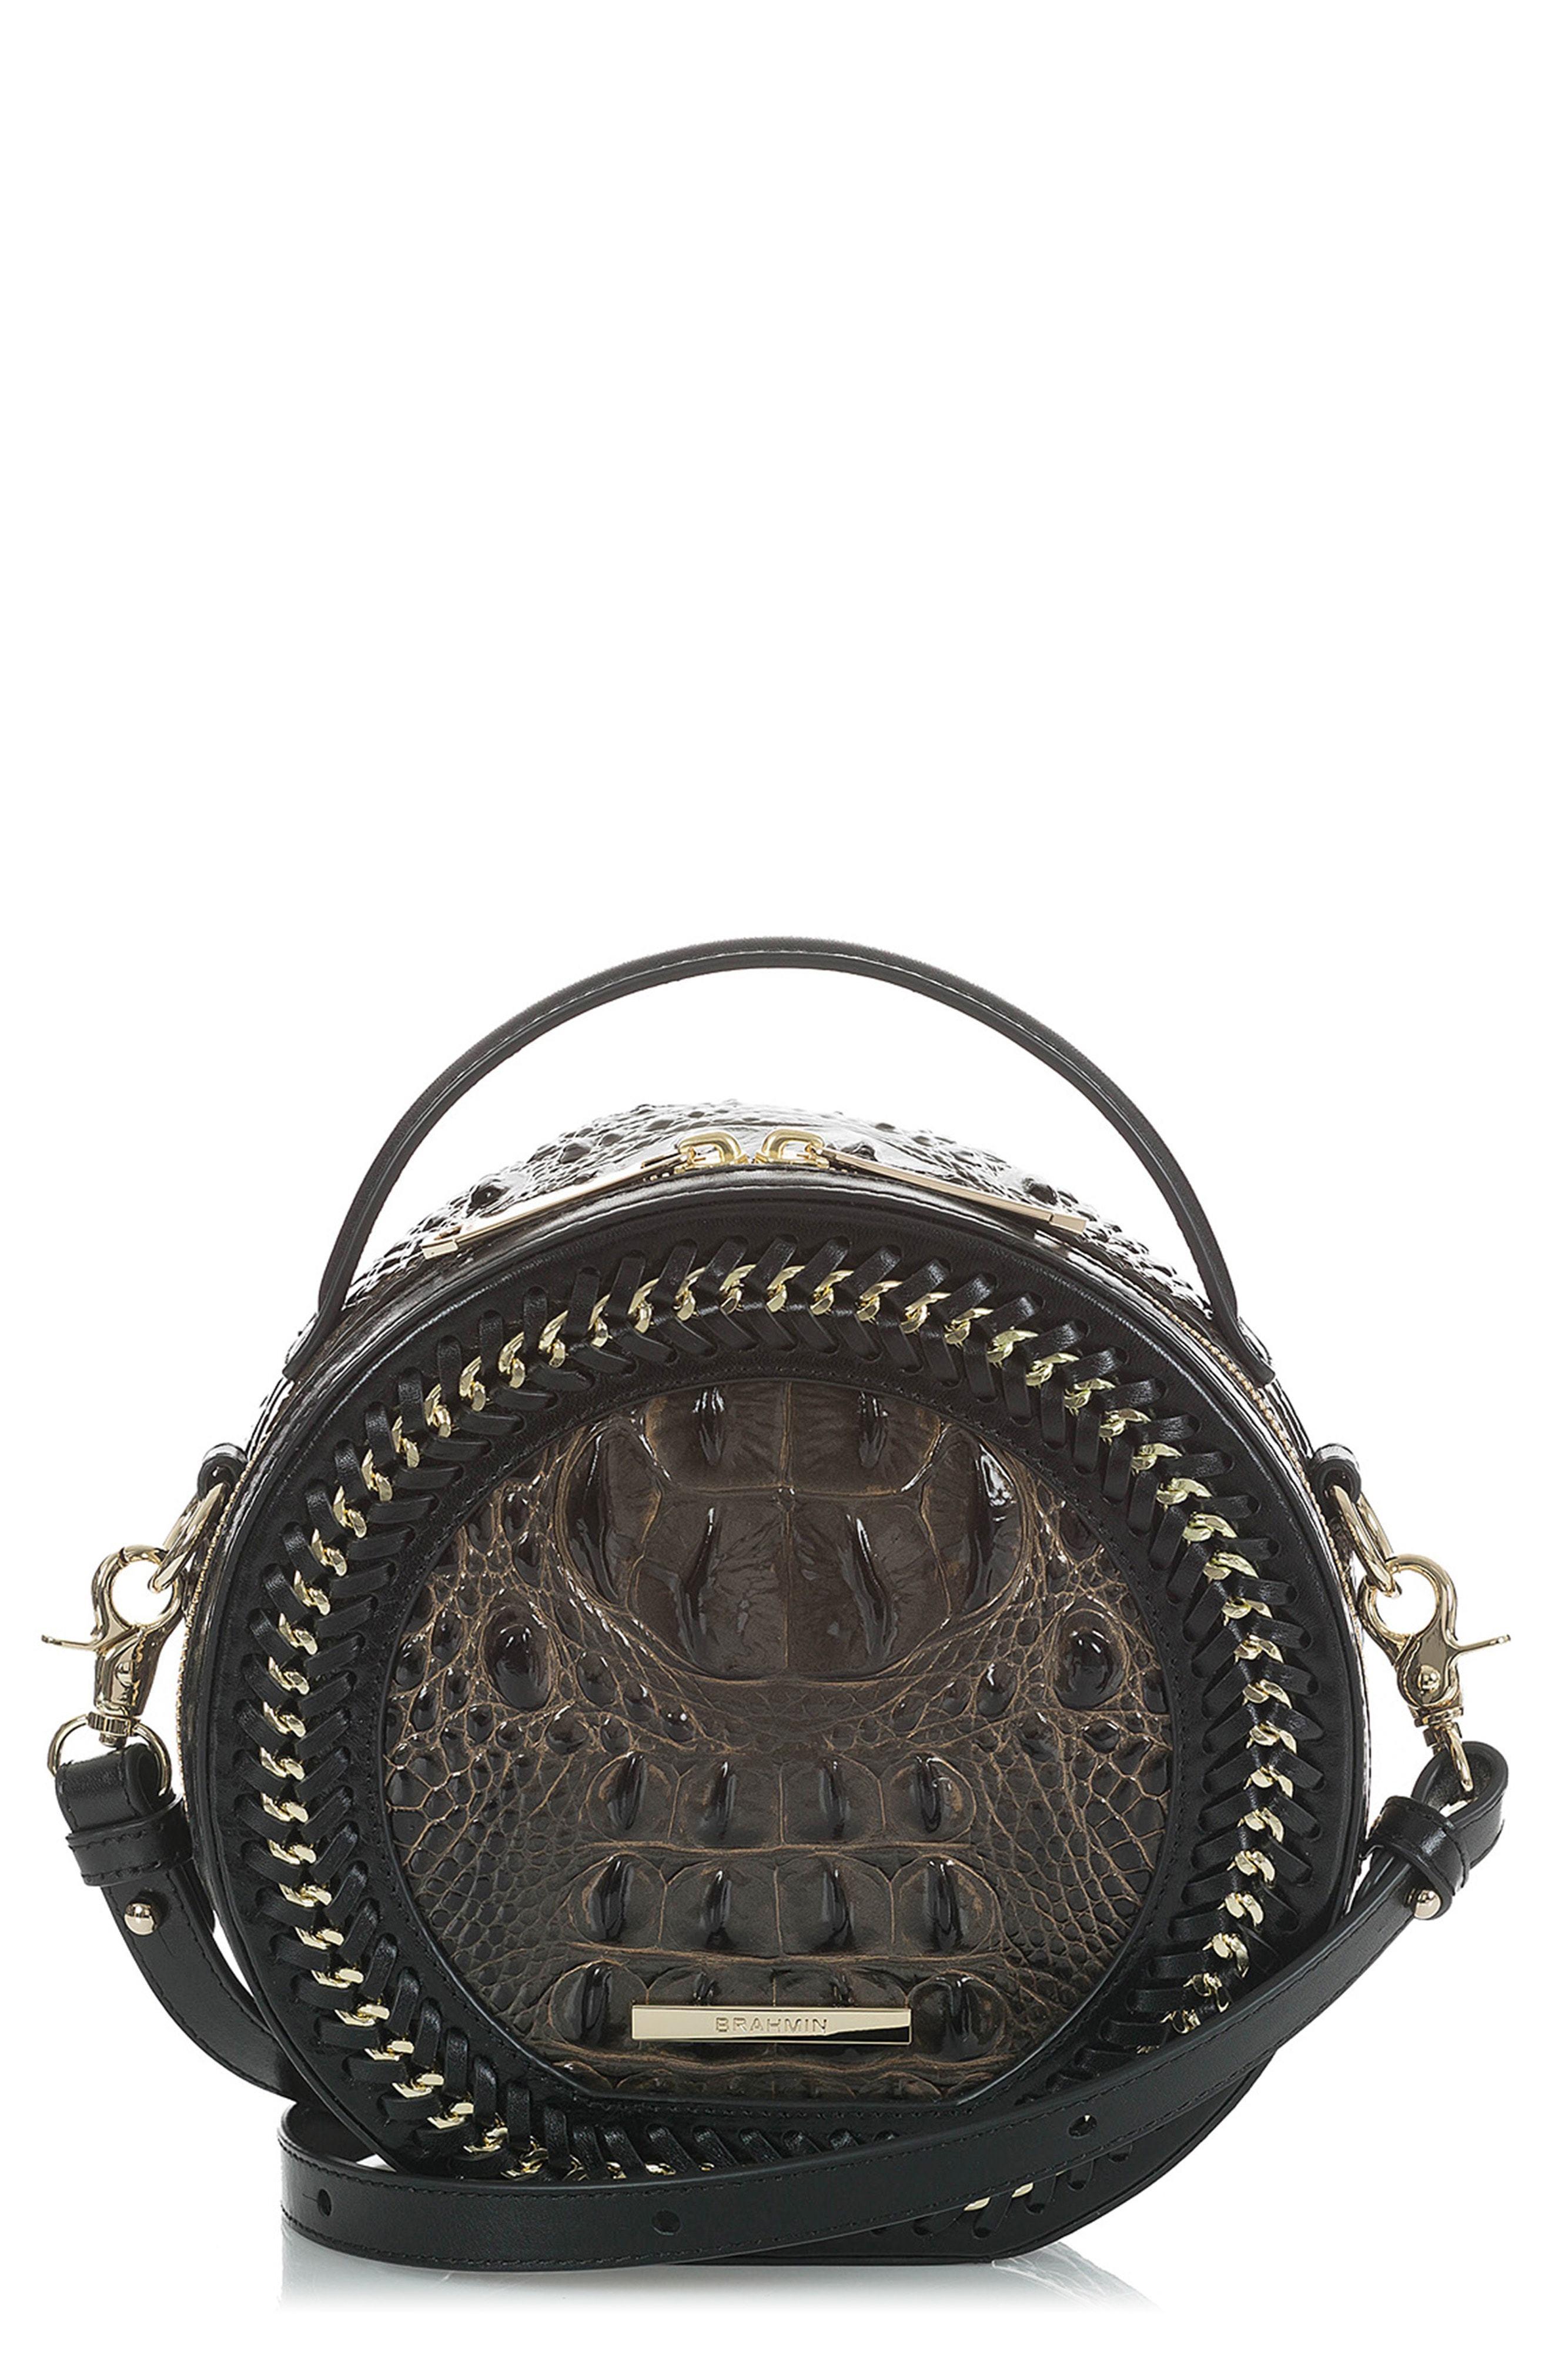 b0af5cb9c0a1 ... Brown Leather Crossbody Bags Brahmin Lane Croc Embossed Leather  Crossbody Bag